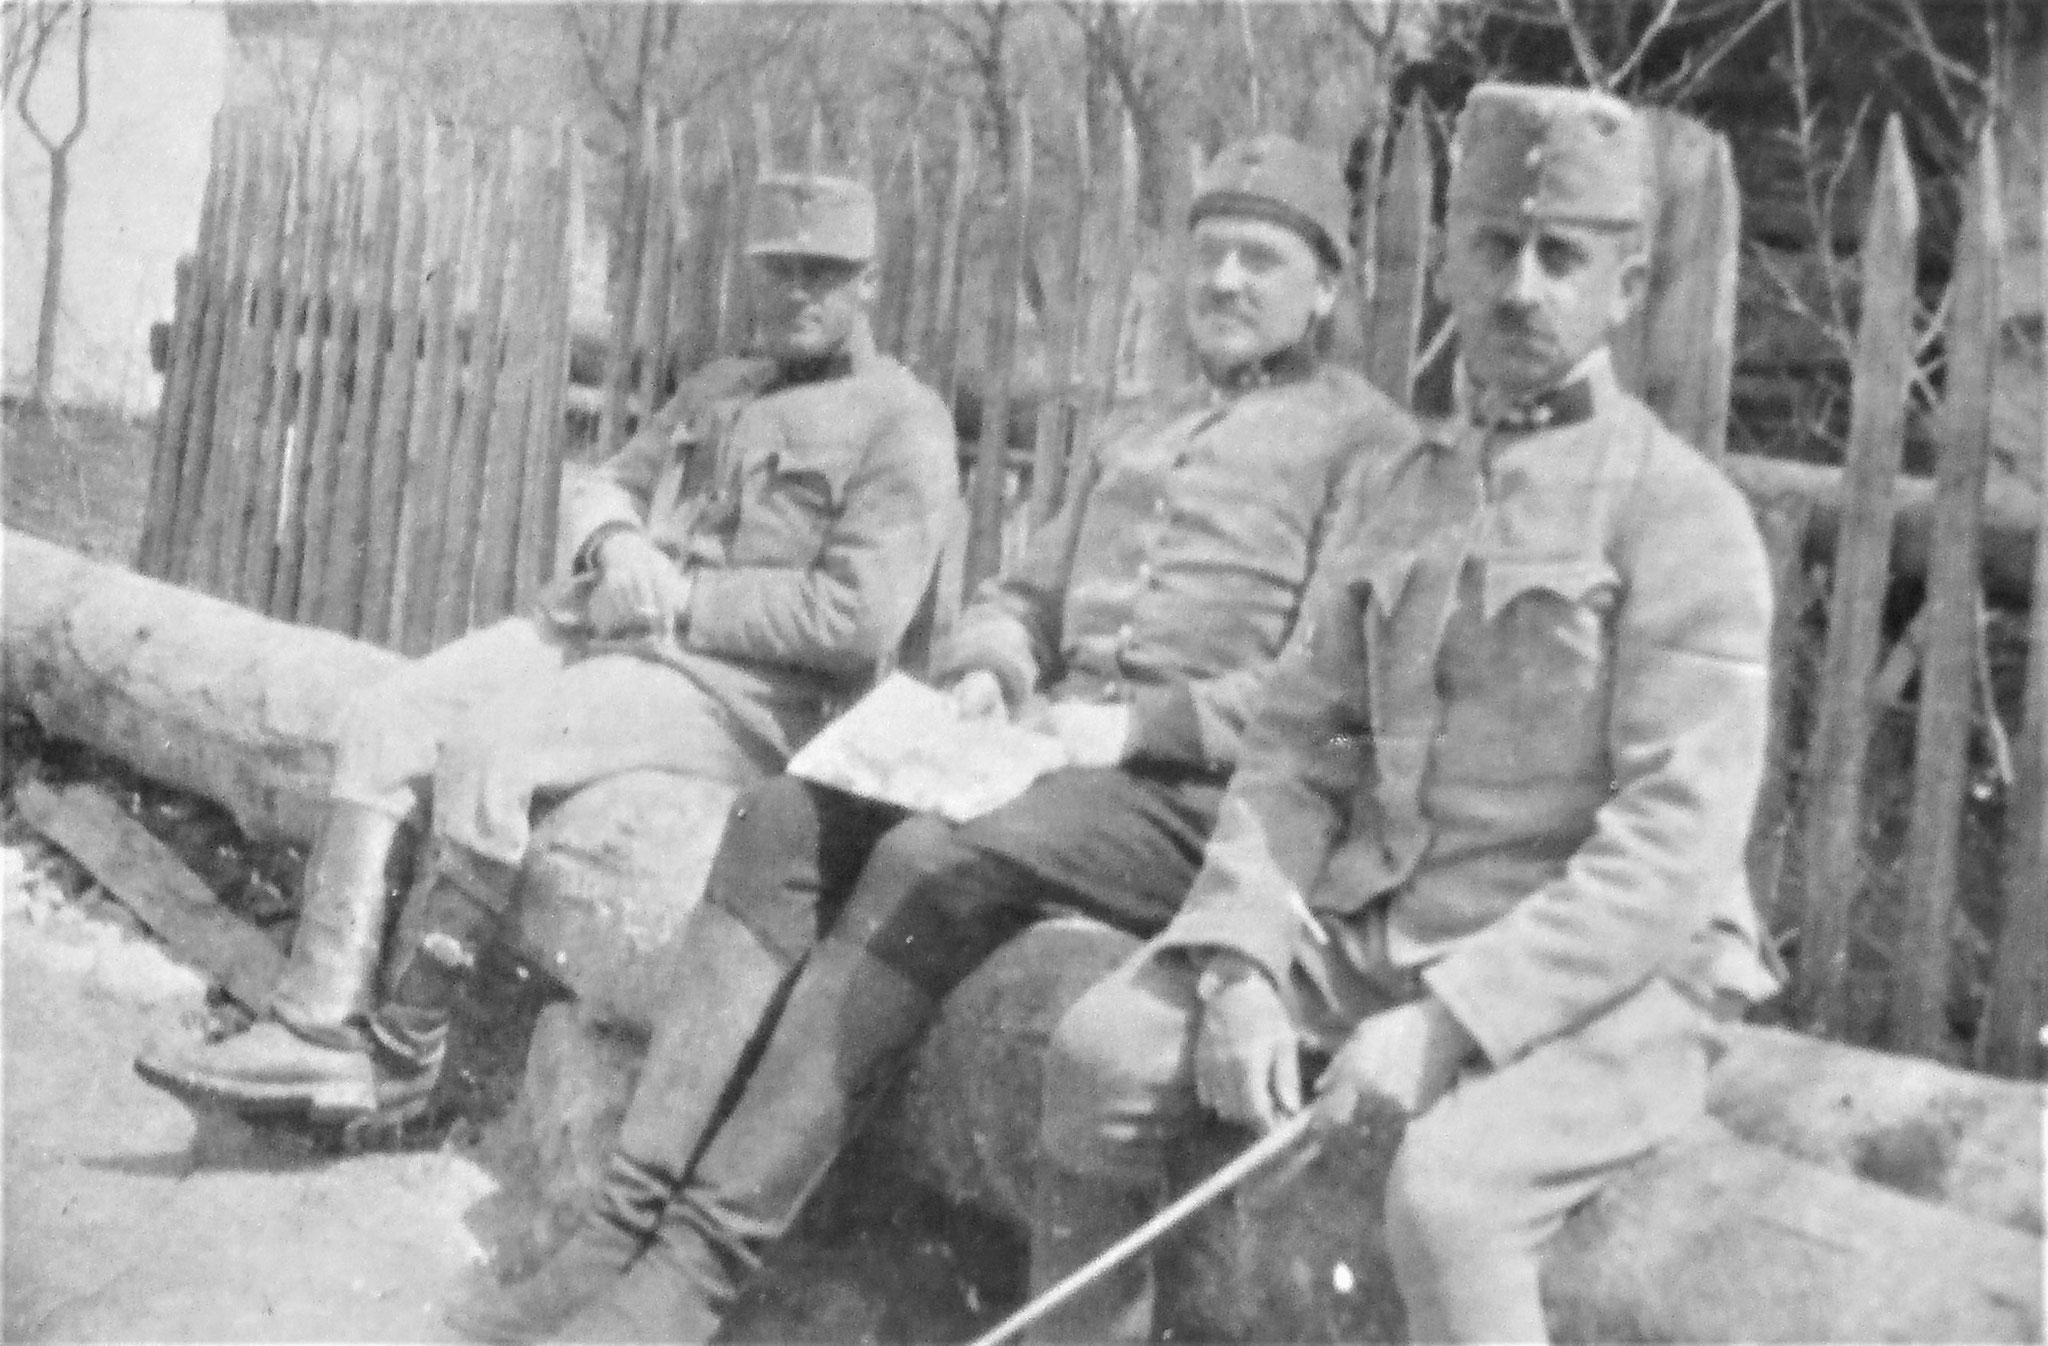 Vor dem Pfarrhaus Lt. Eduard Aldrian (4./FK.8), ich, Rtm Lang.